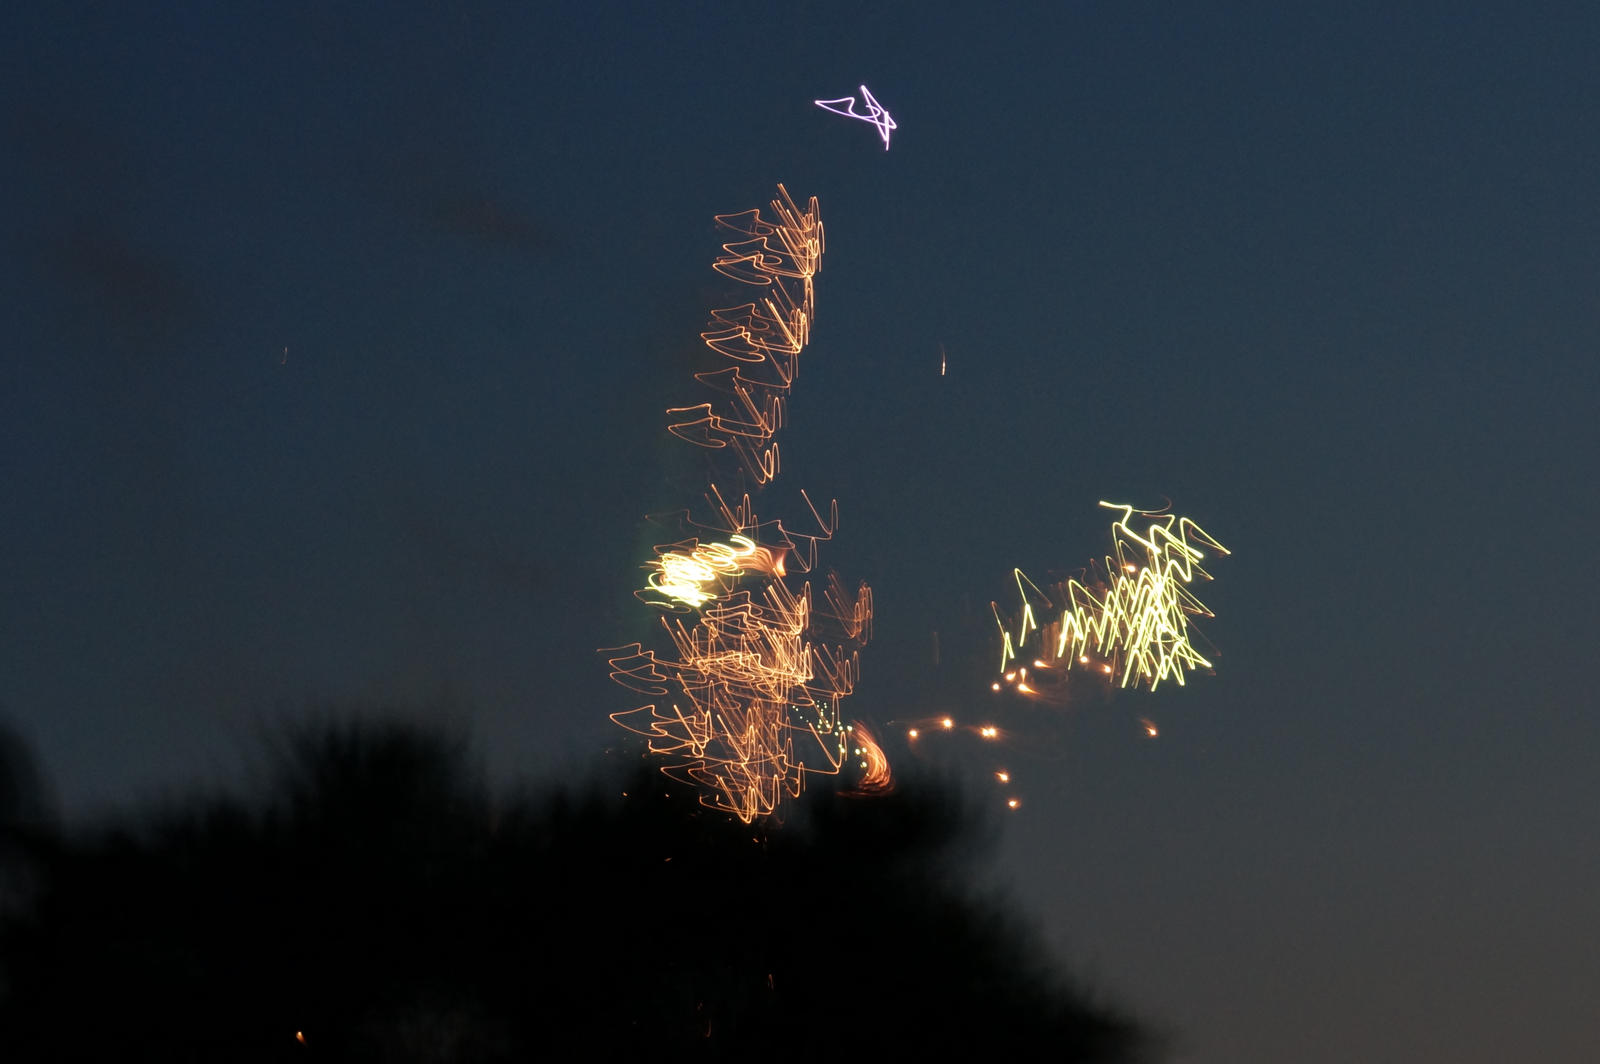 Distorted Fireworks 004